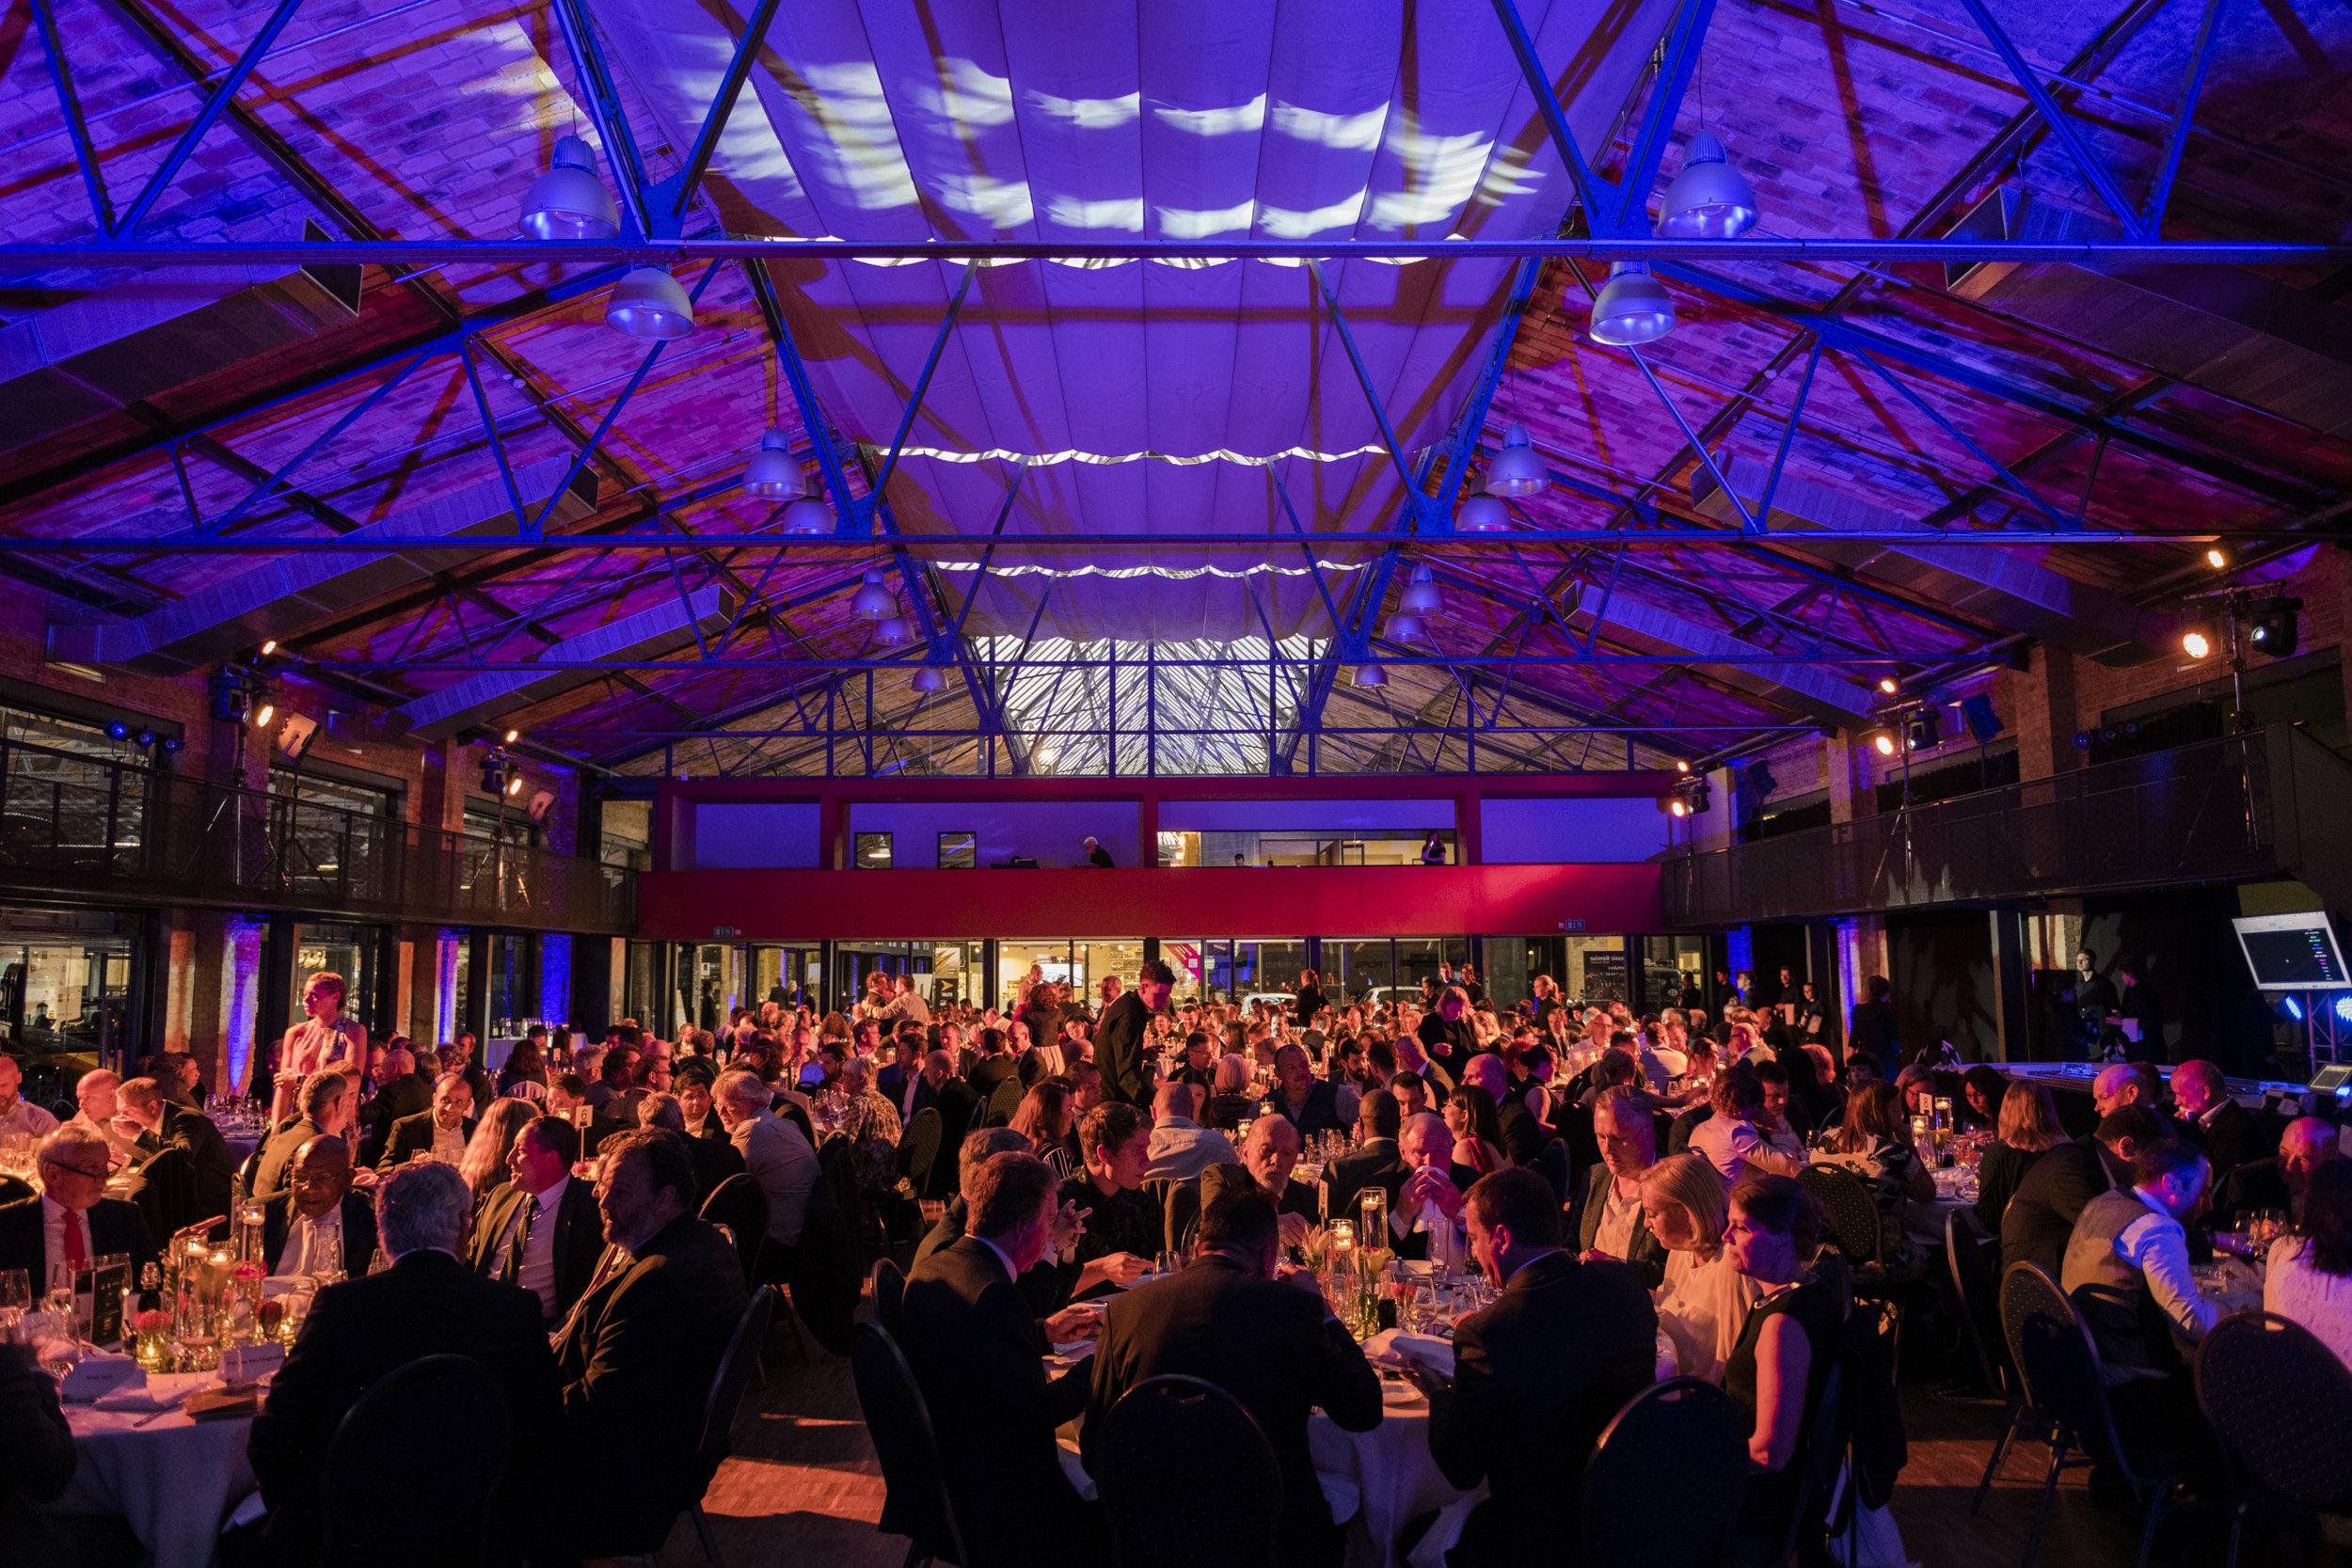 2018-05-16_FESPA_Awards_0106.jpg